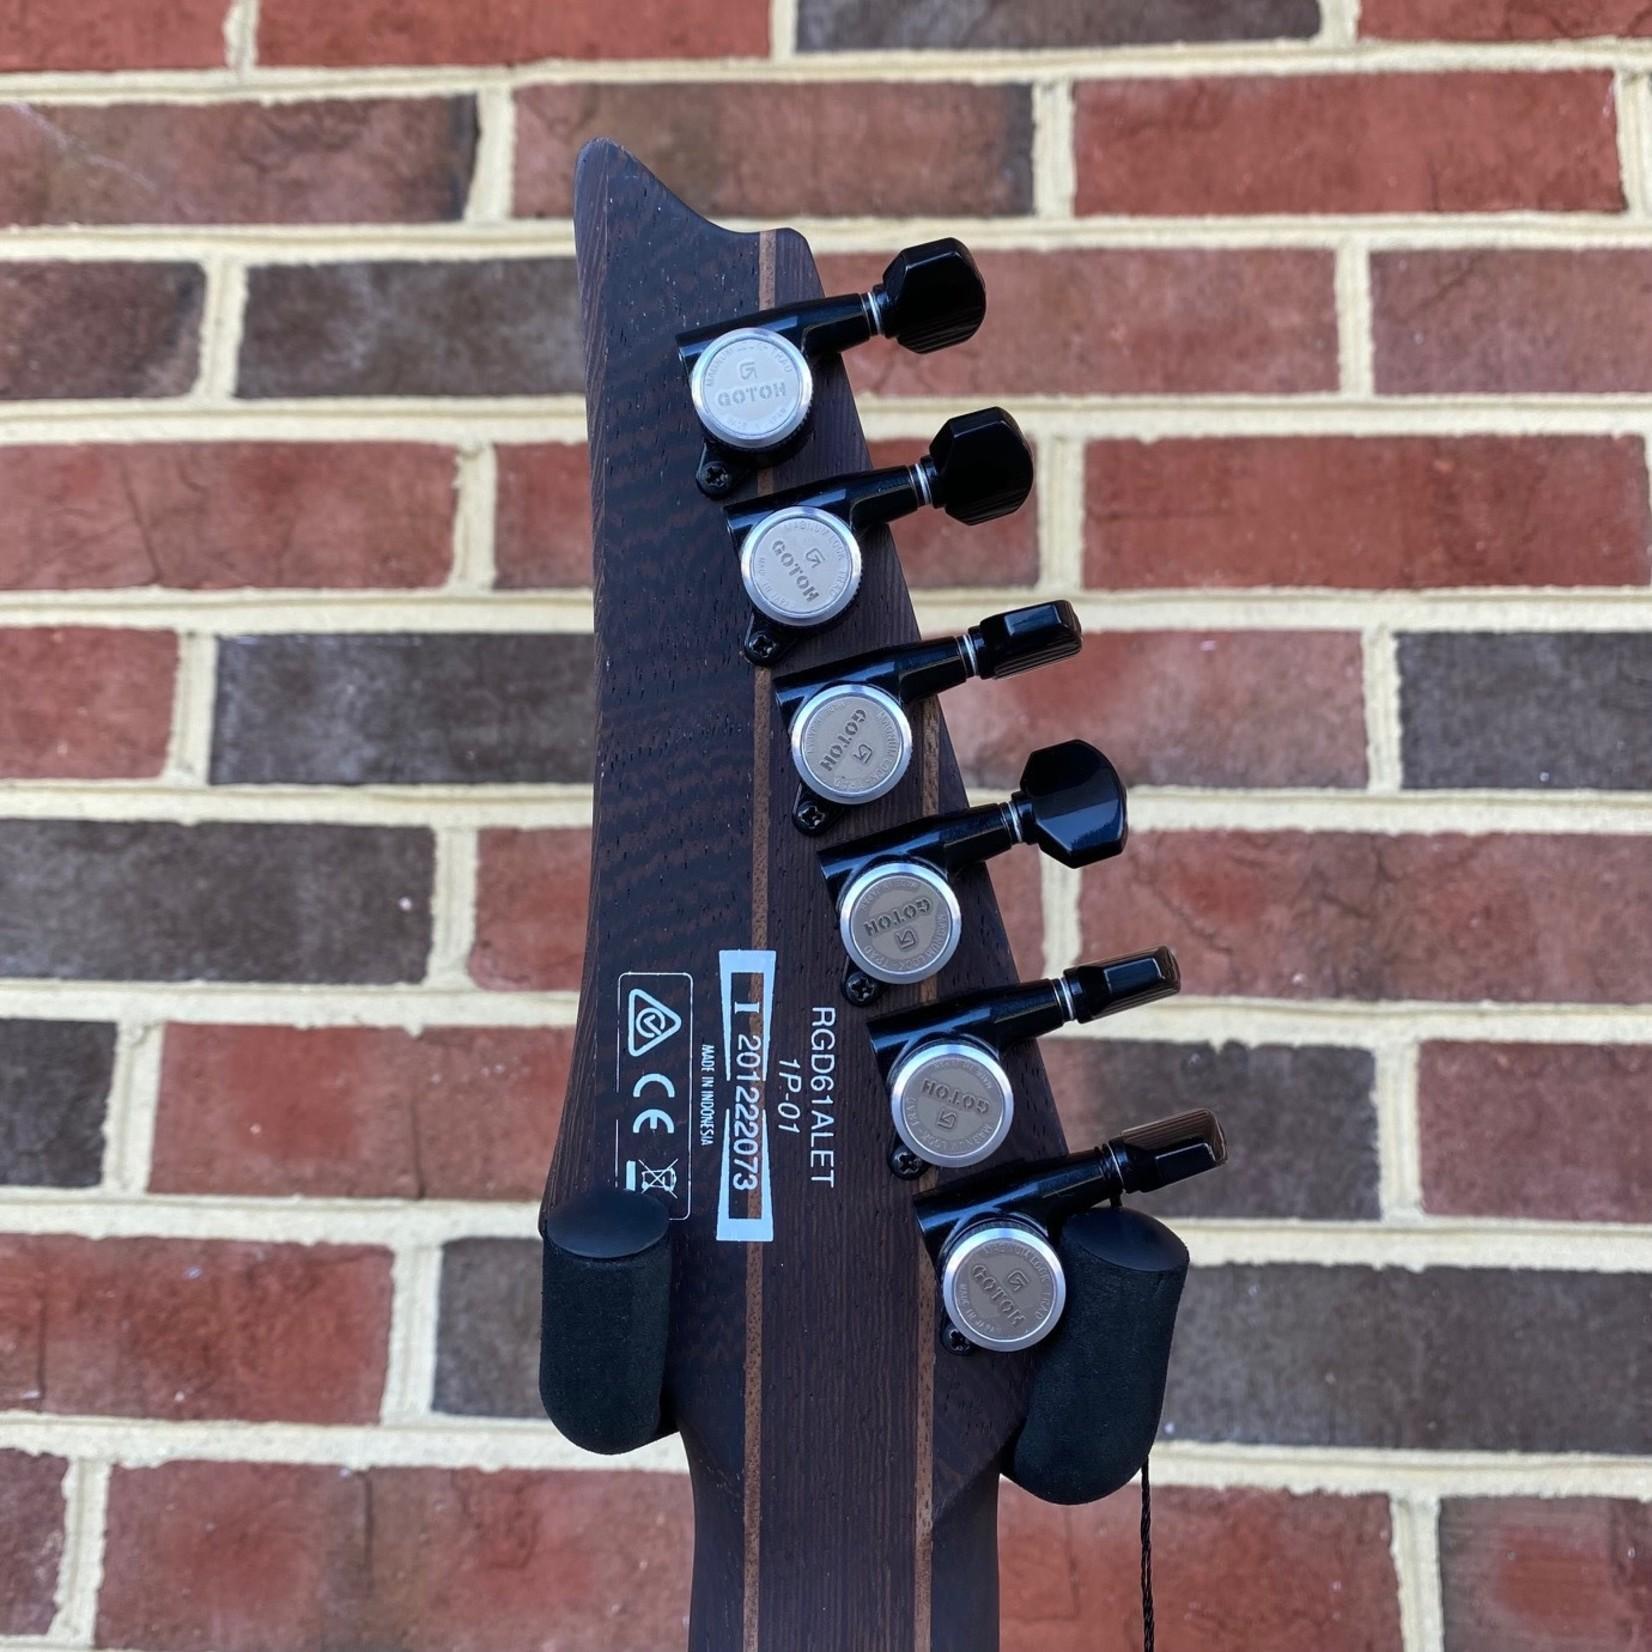 Ibanez Ibanez Axion Label RGD61ALETMGM, Metallic Gray Matte, Evertune Bridge, Fishman Fluence Modern Pickups